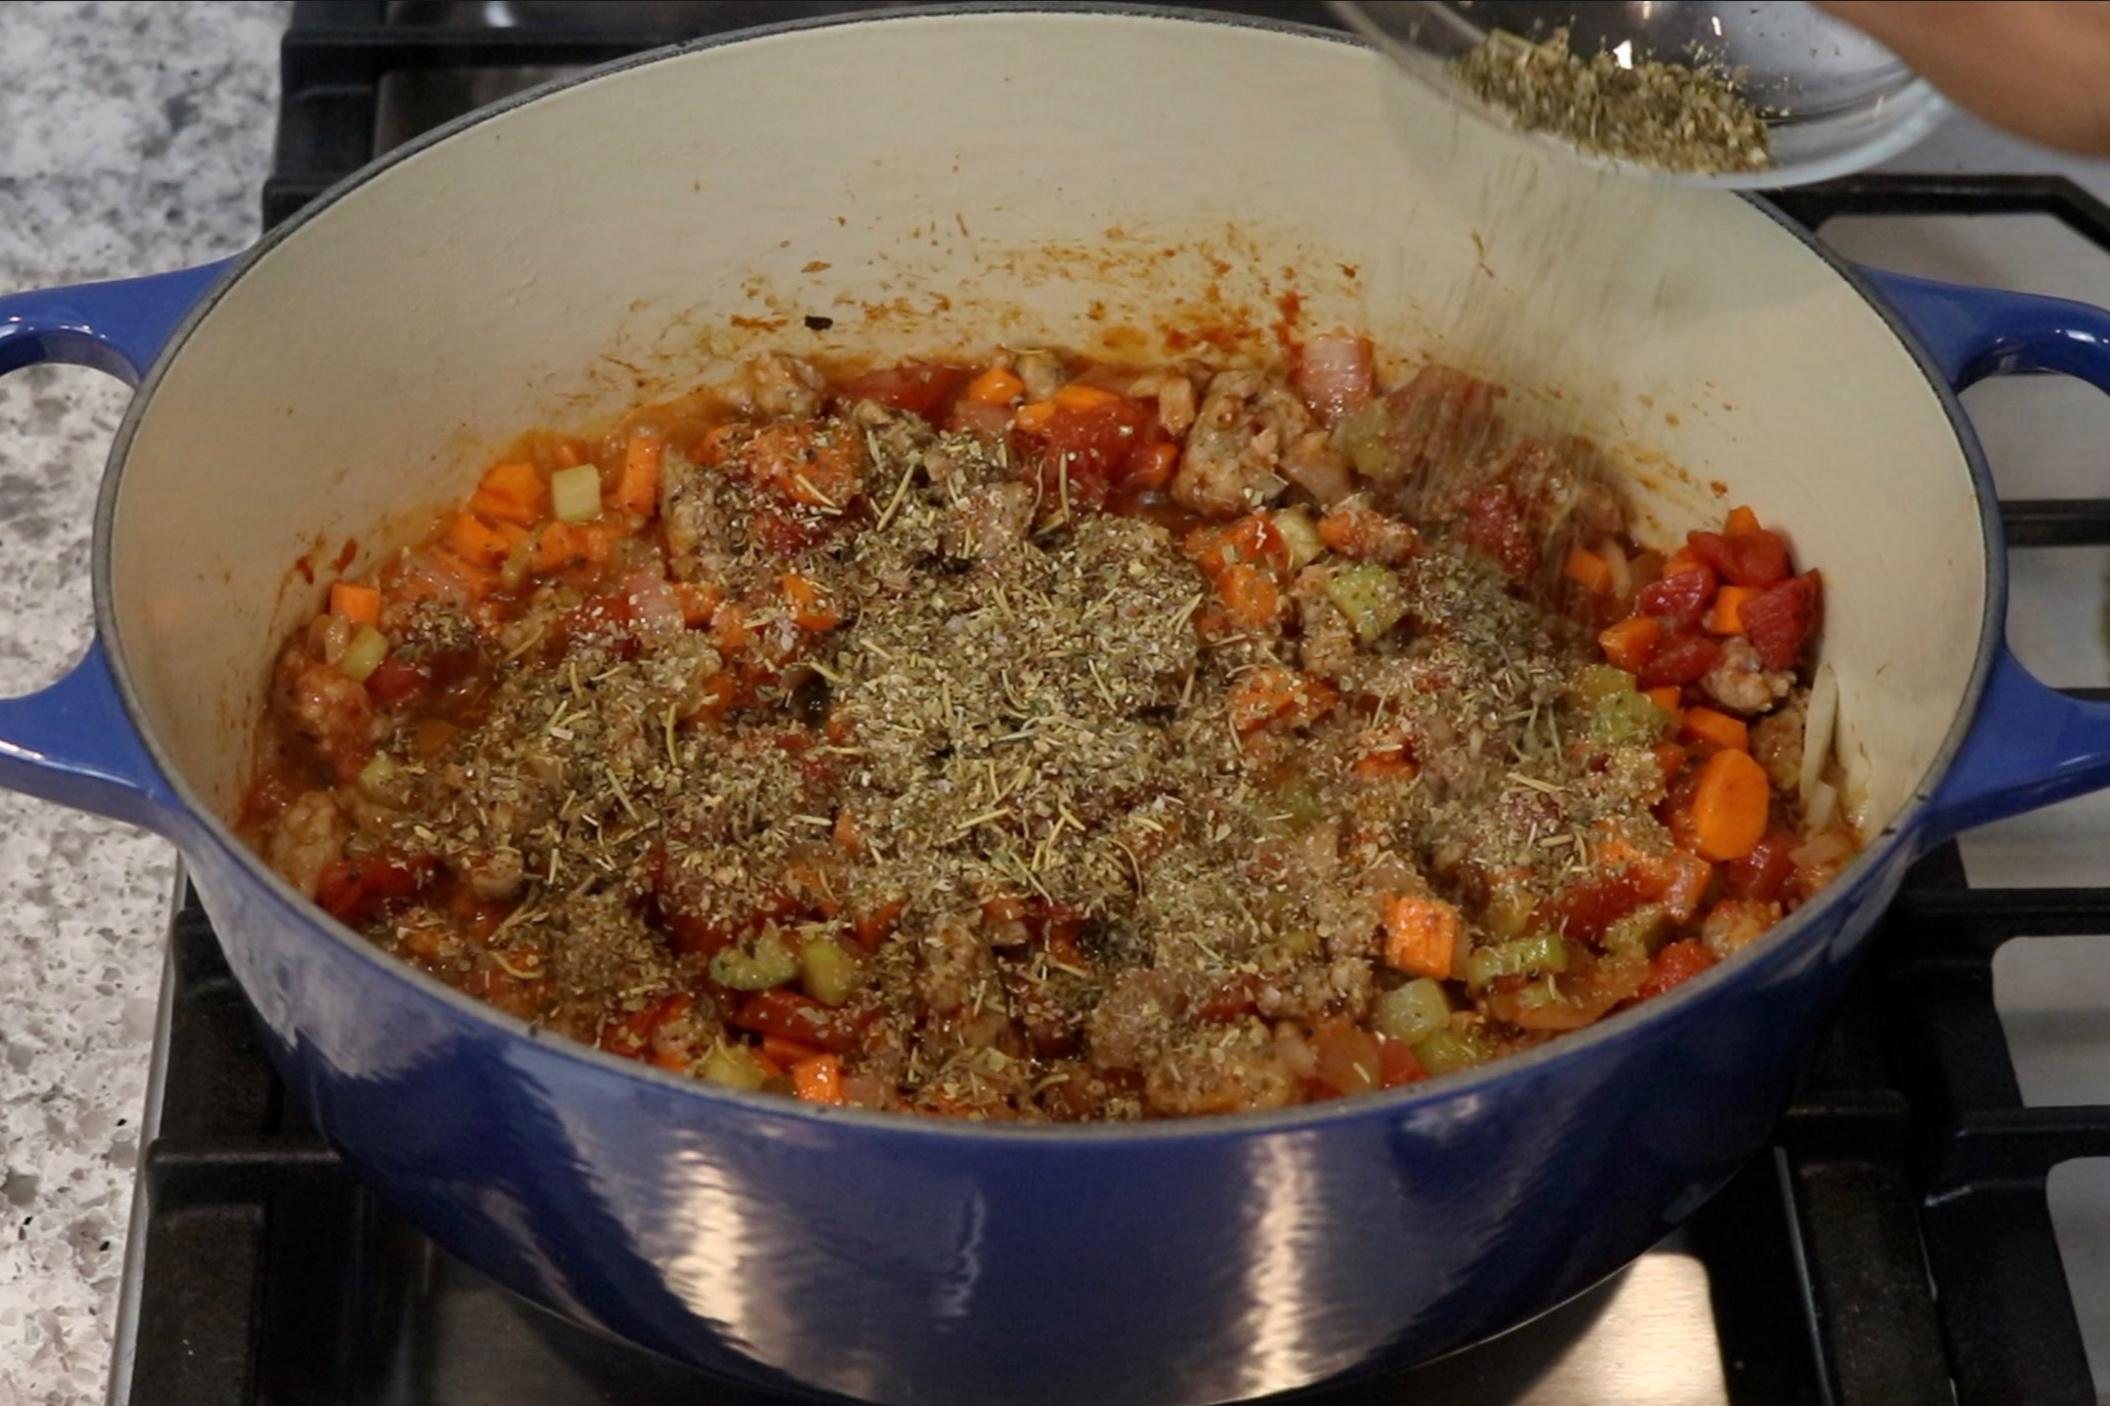 5. Stir in the Italian seasoning. -